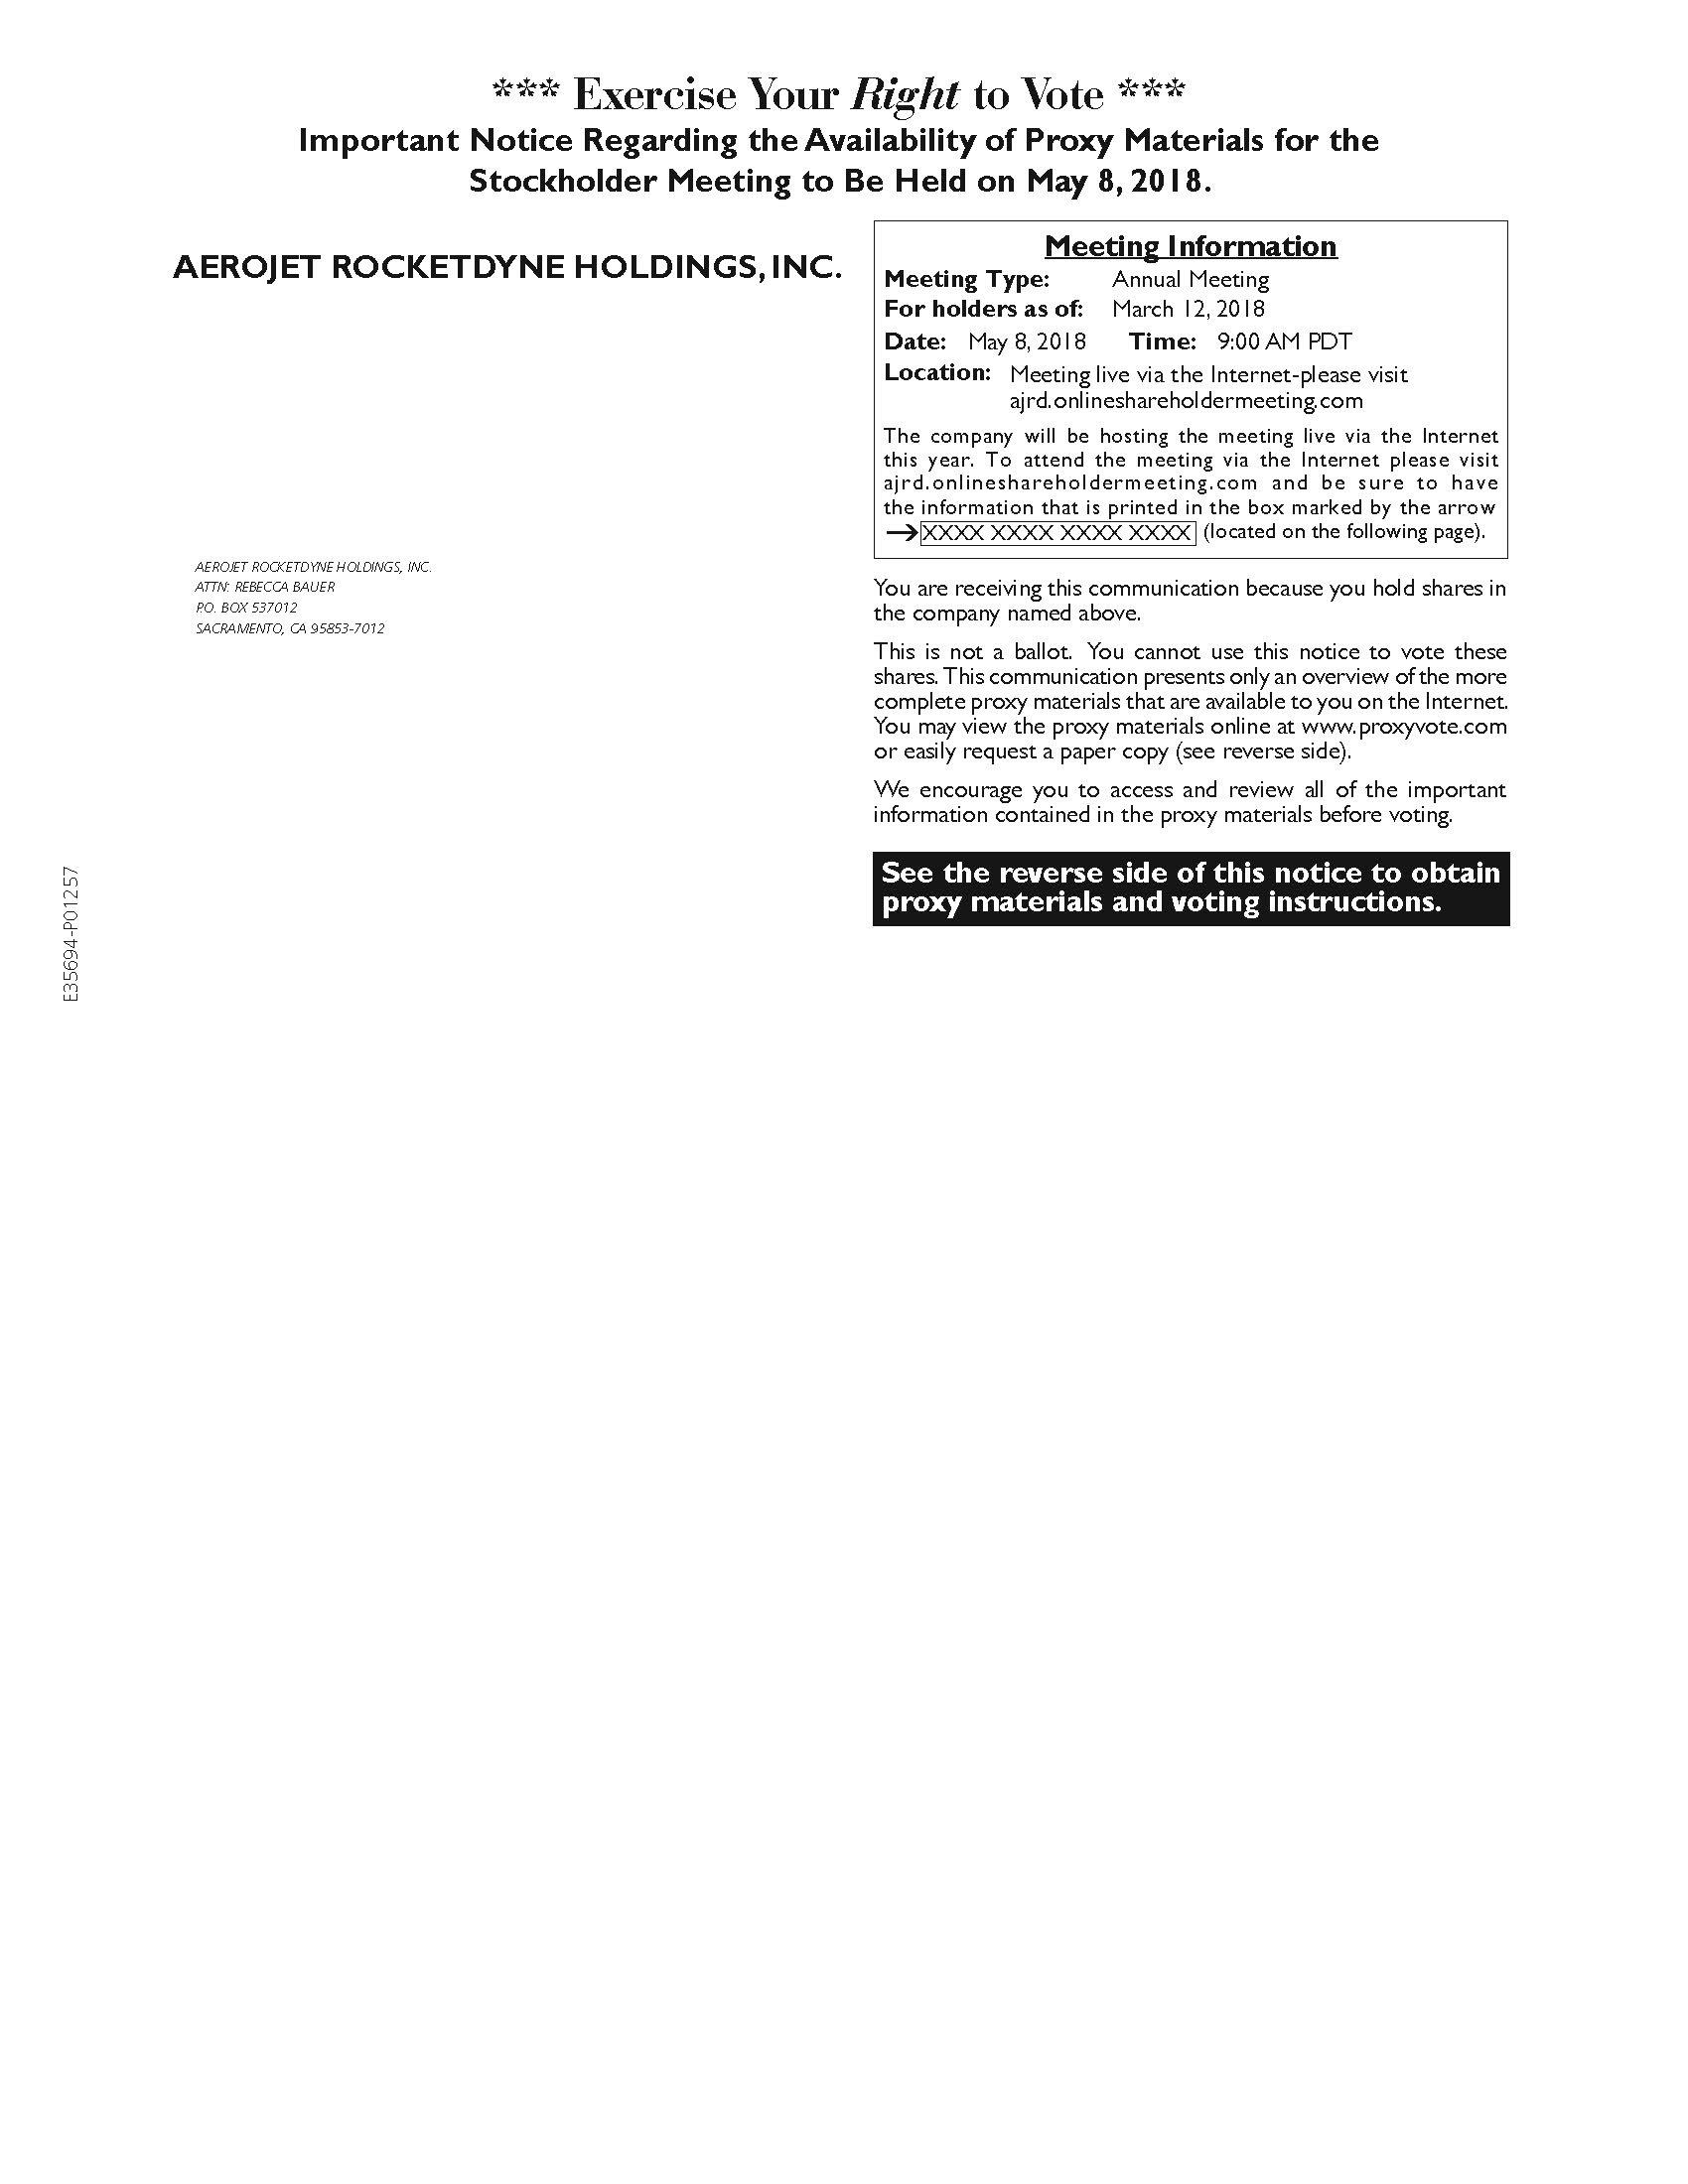 BROADRIDGENOTICECAR22018339A.JPG